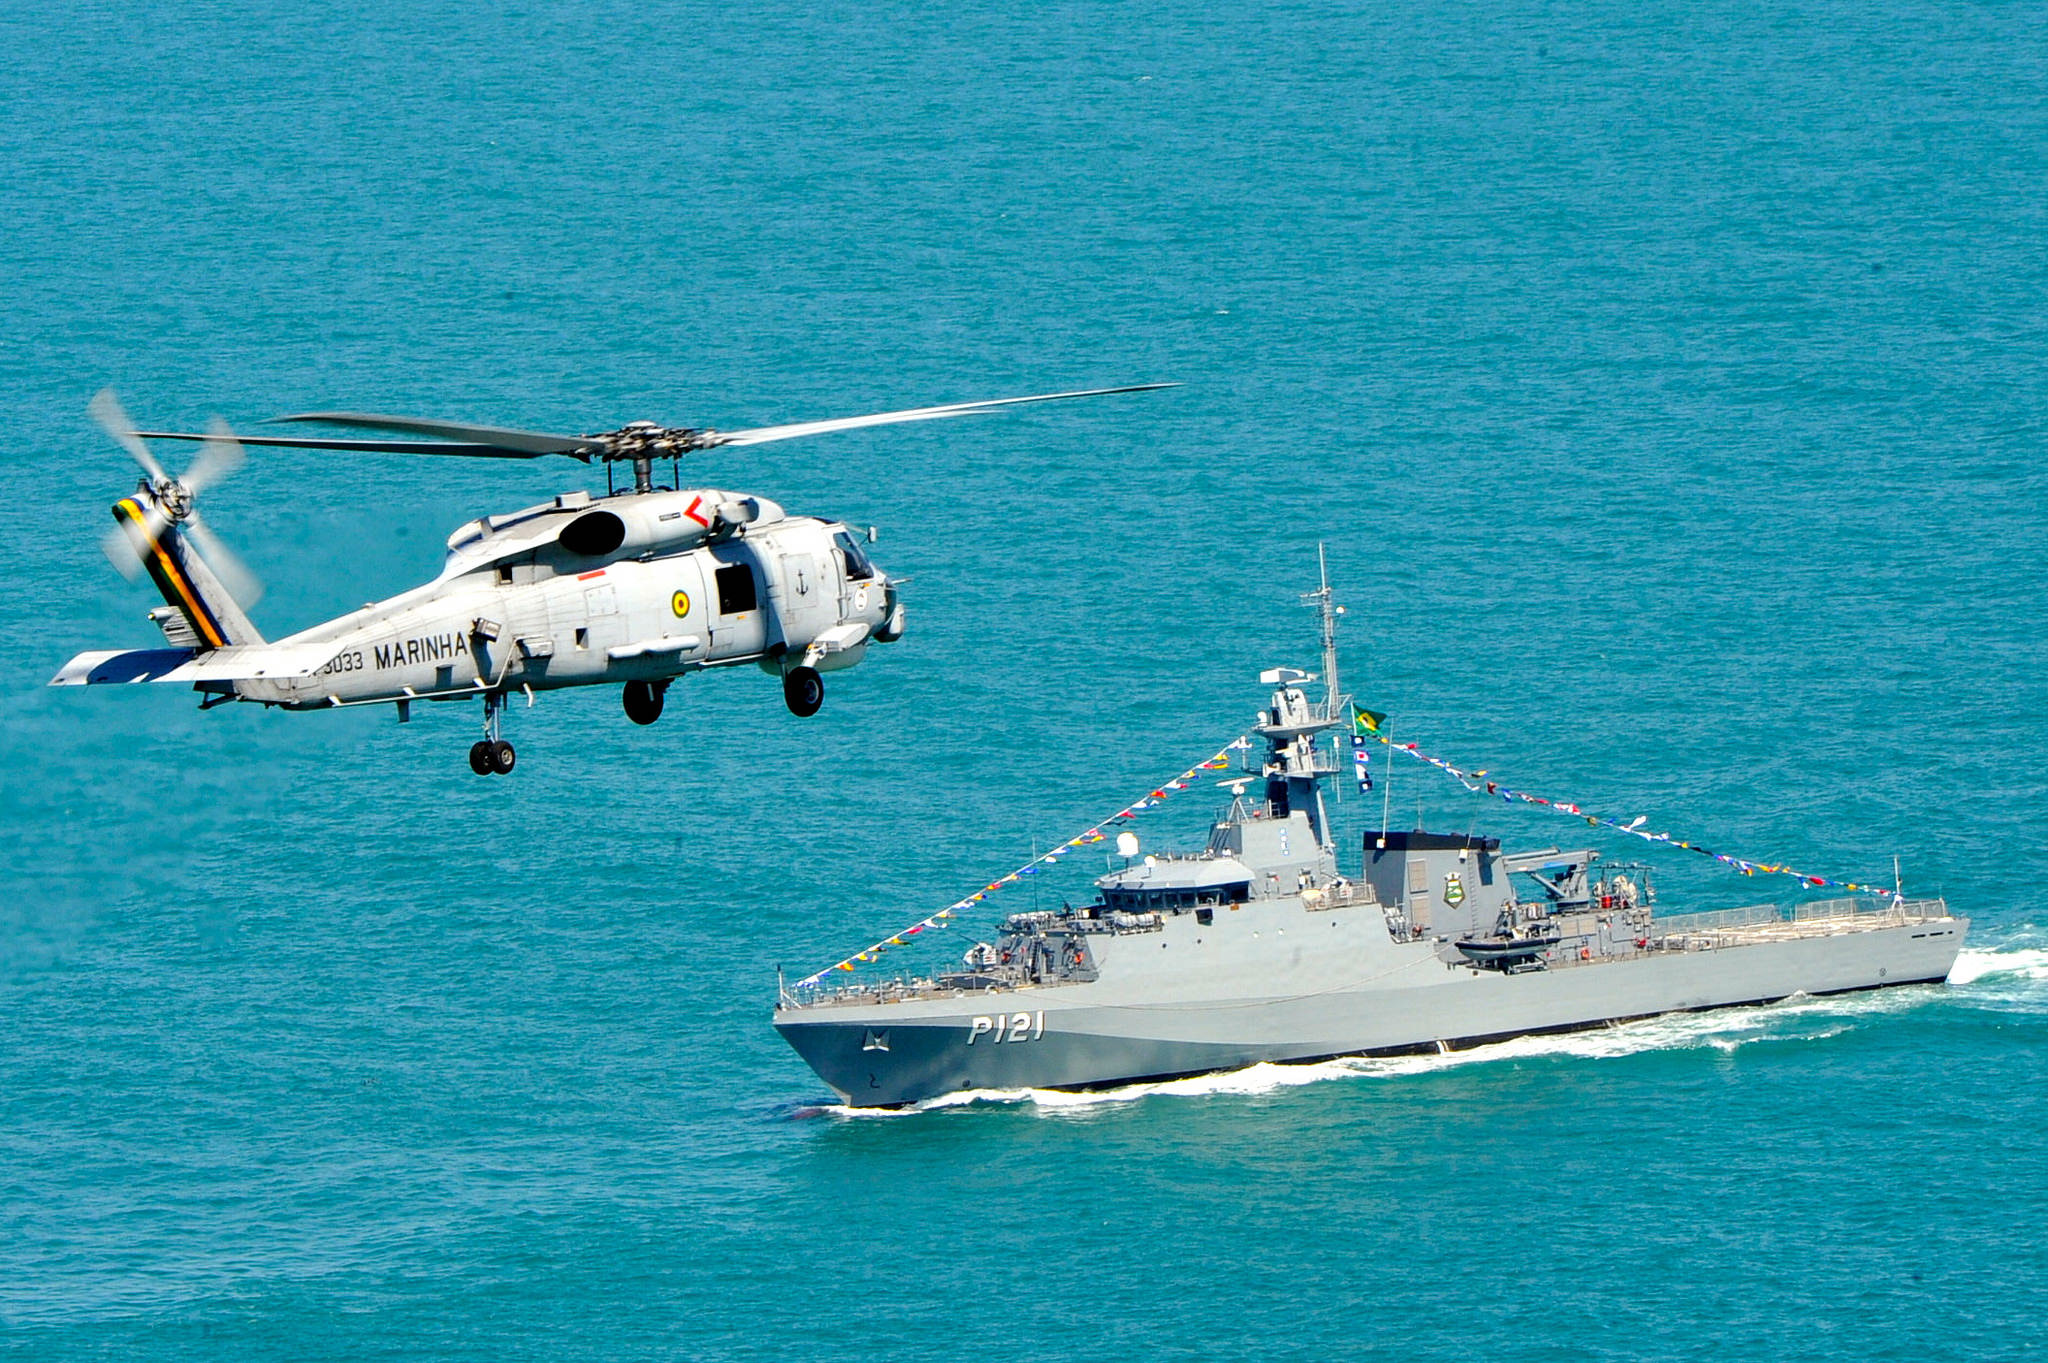 SH-16 Seahawk e NPaOc Apa